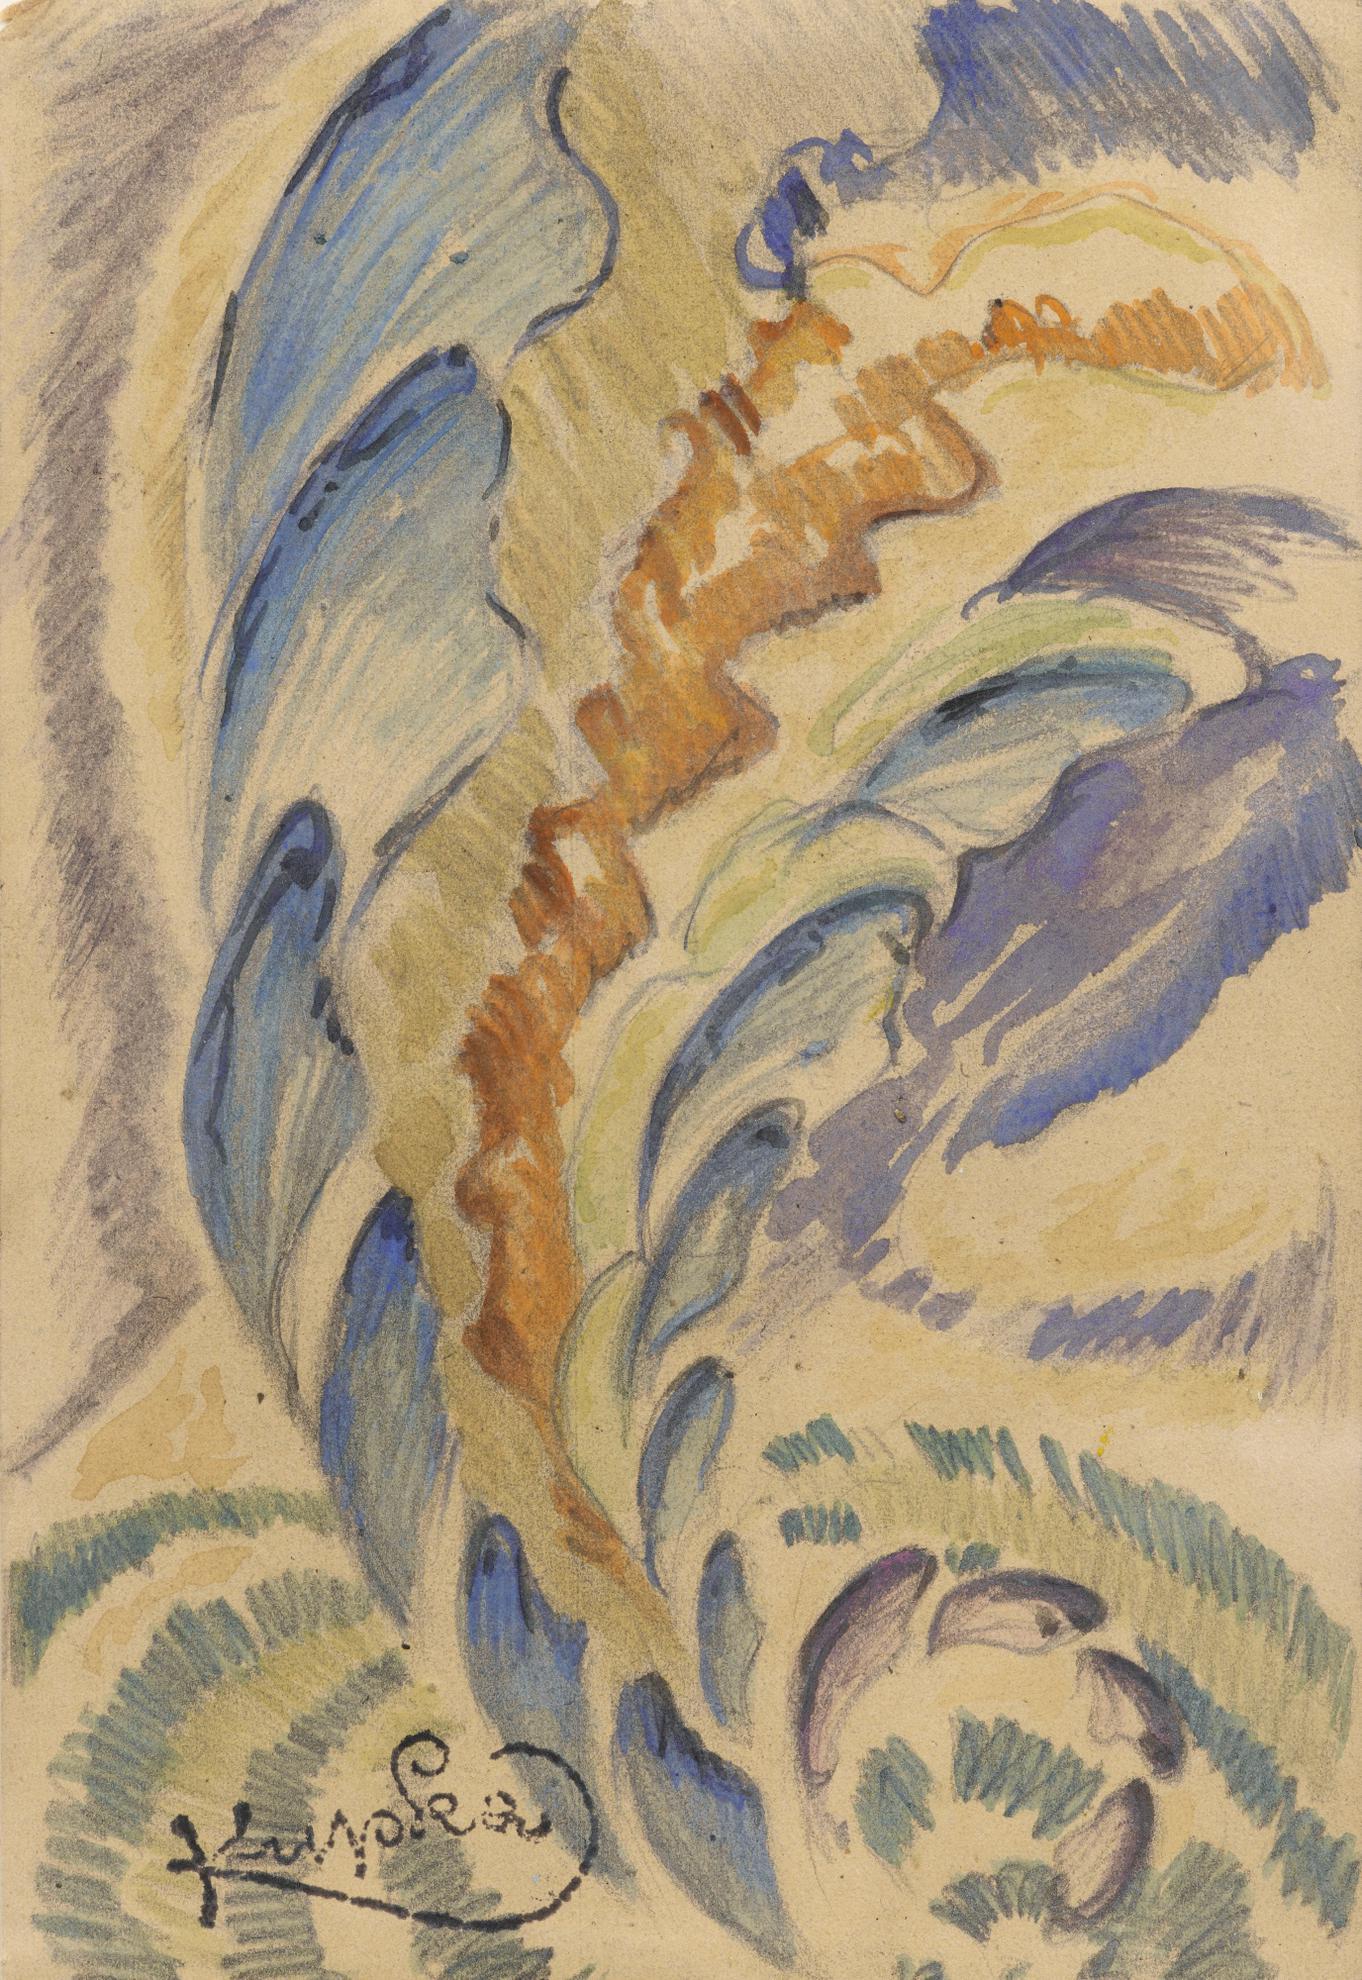 Frantisek Kupka-Composition-1920